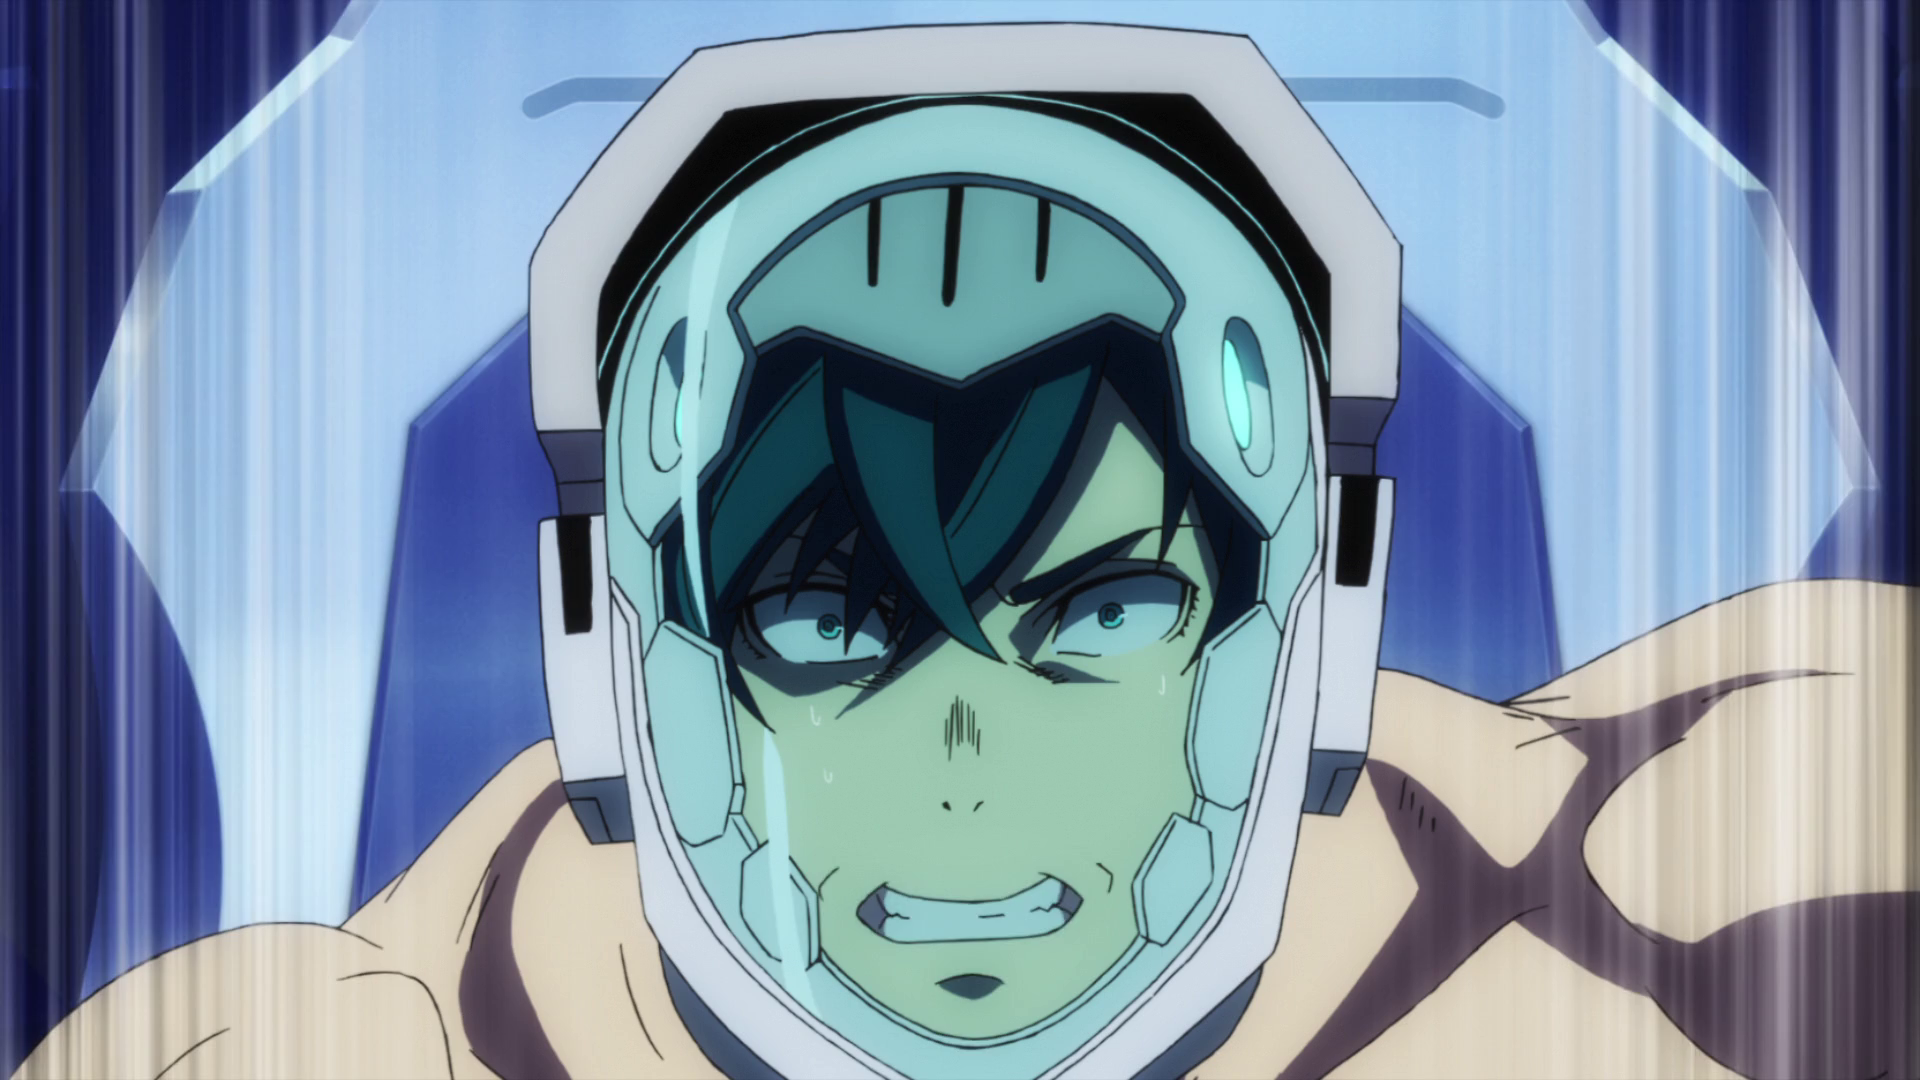 [Golumpa] Space Battleship Tiramisu - 05 (Uchuu Senkan